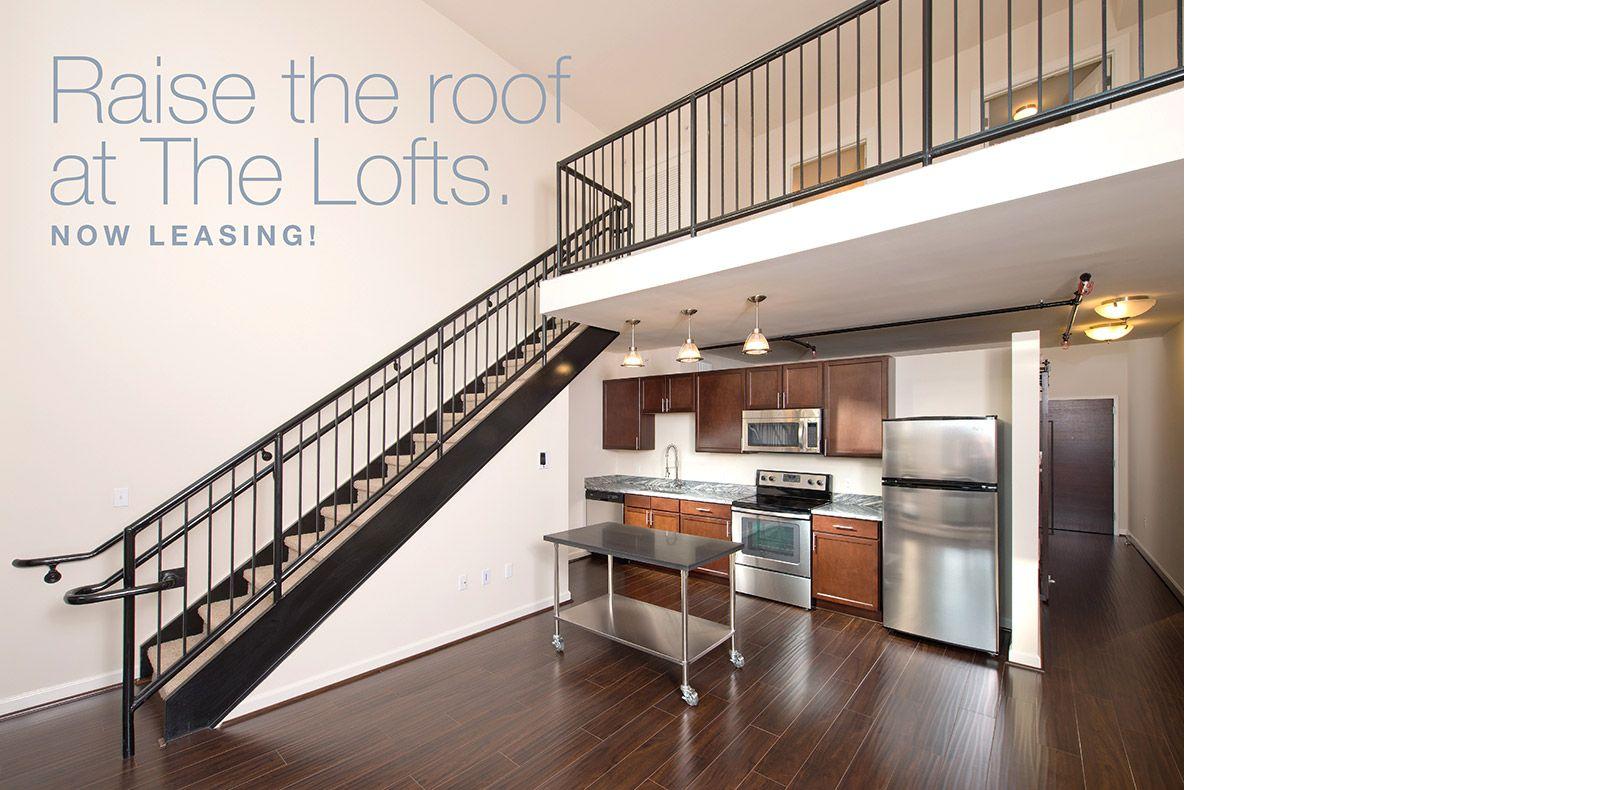 Studio, 1, & 2 Bedroom Apartments in Fairfax | tiny house stuff ...